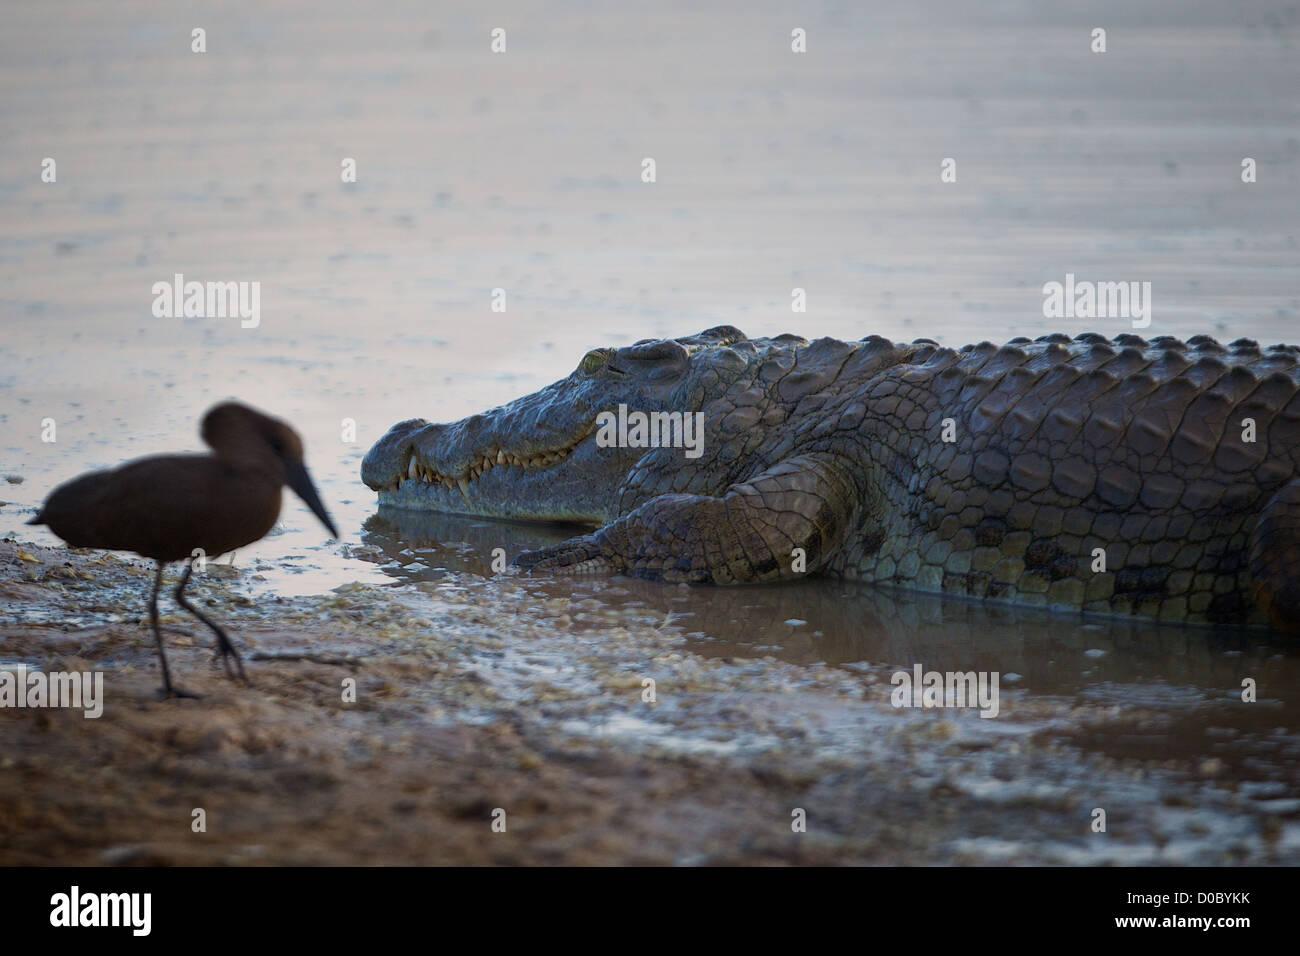 Nile crocodile Mikumi National park. Southern Tanzania. Africa - Stock Image